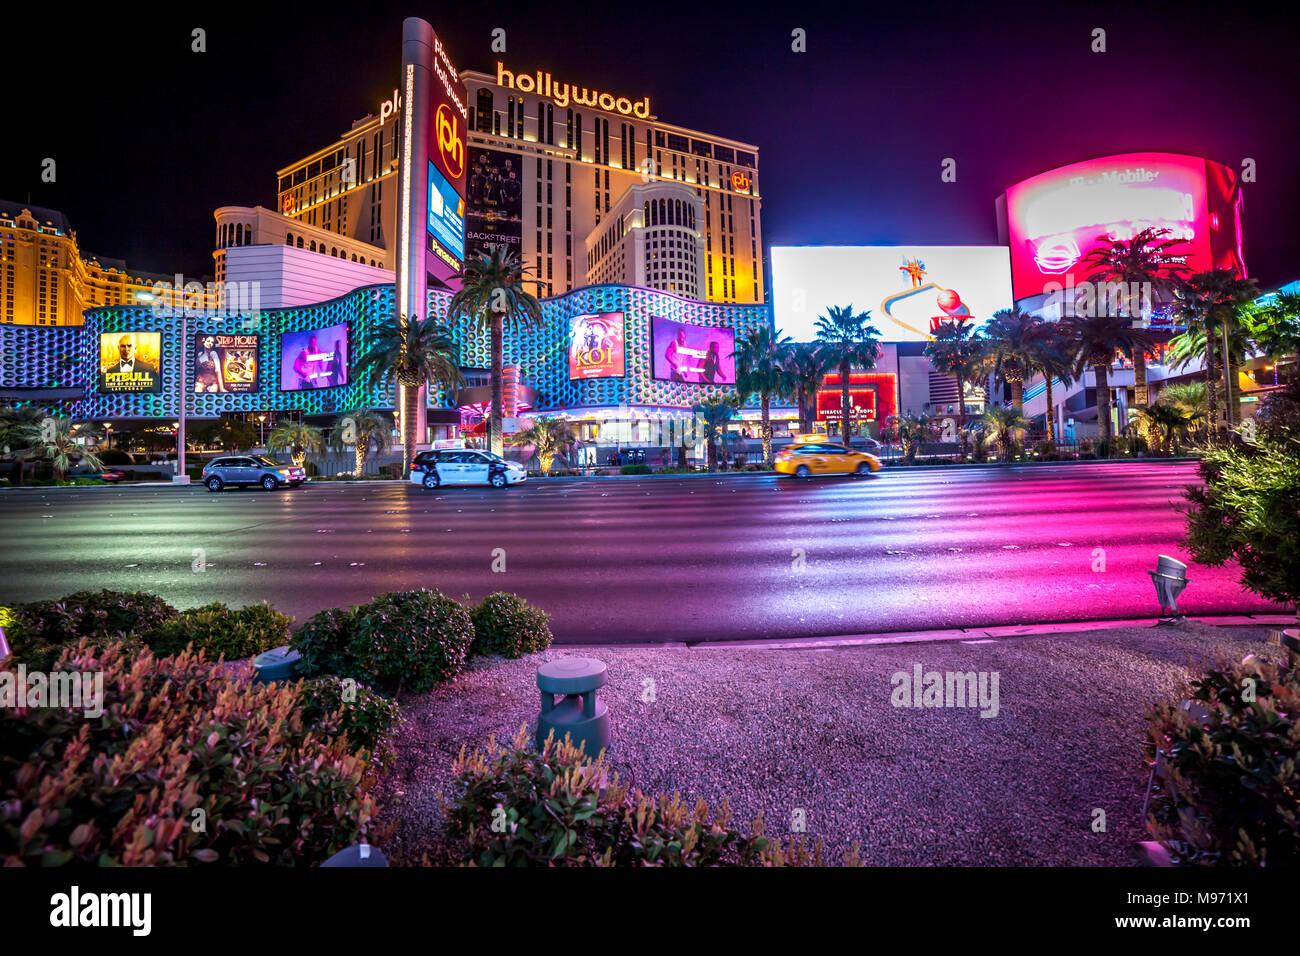 Planet Hollywood Vegas Stock Photos & Planet Hollywood Vegas